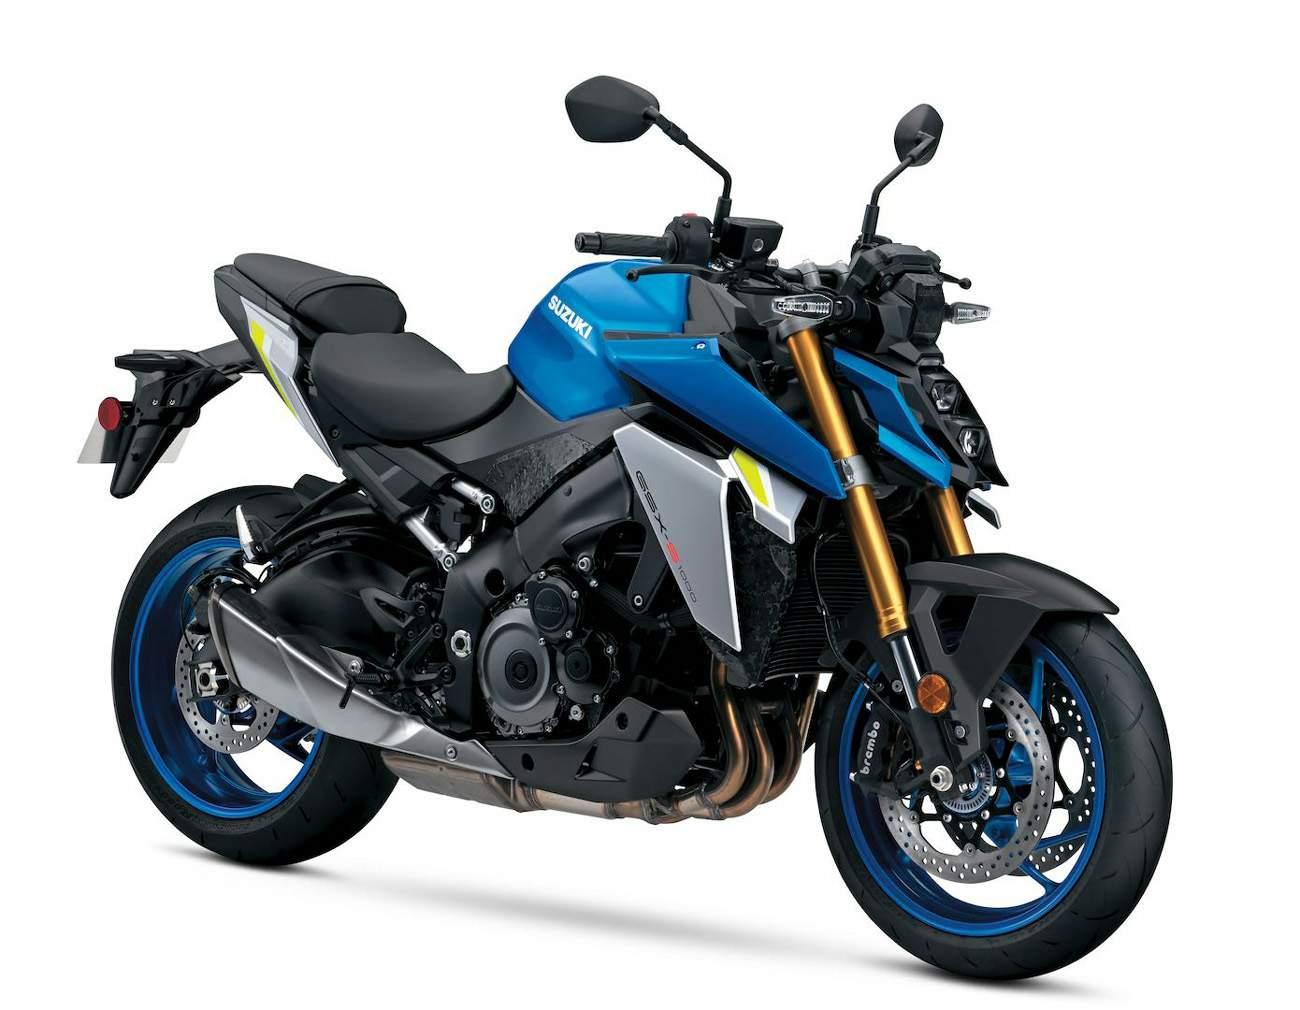 Suzuki GSX-S 1000 technical specifications